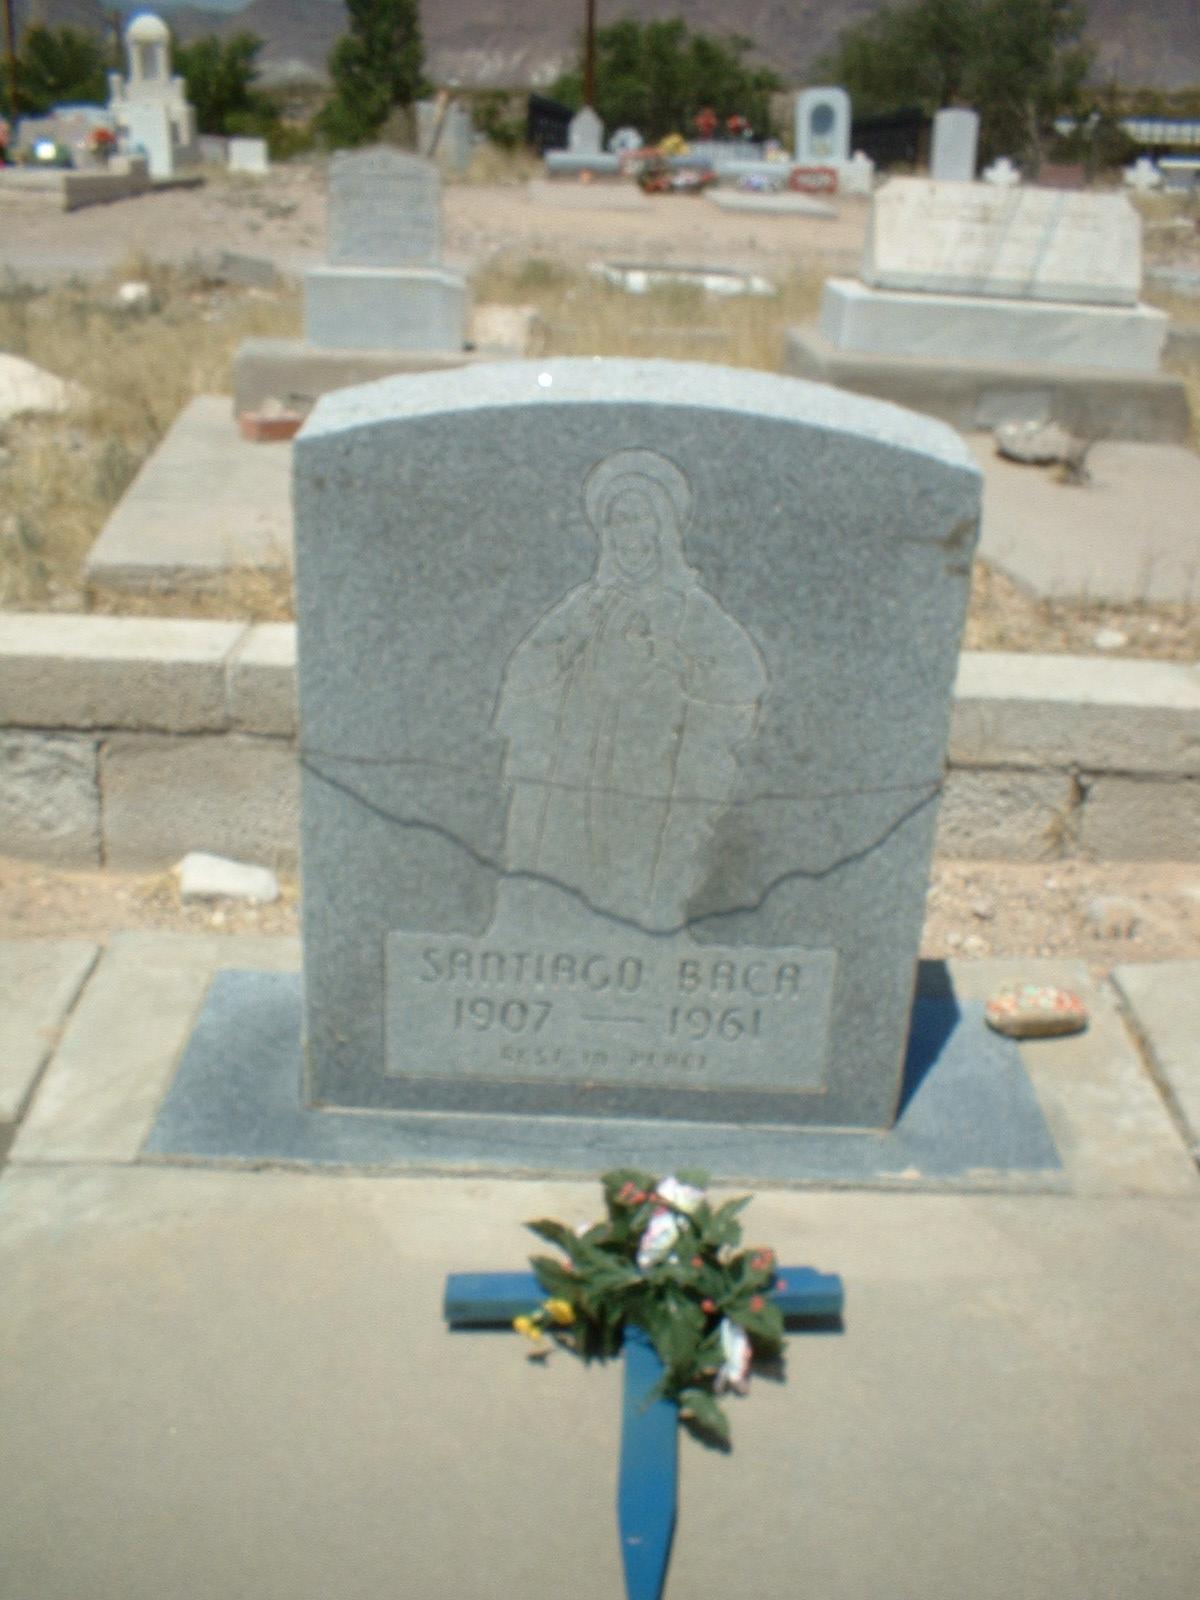 Socorro and the beyond graveyard rabbit sunday may 2 2010 publicscrutiny Images